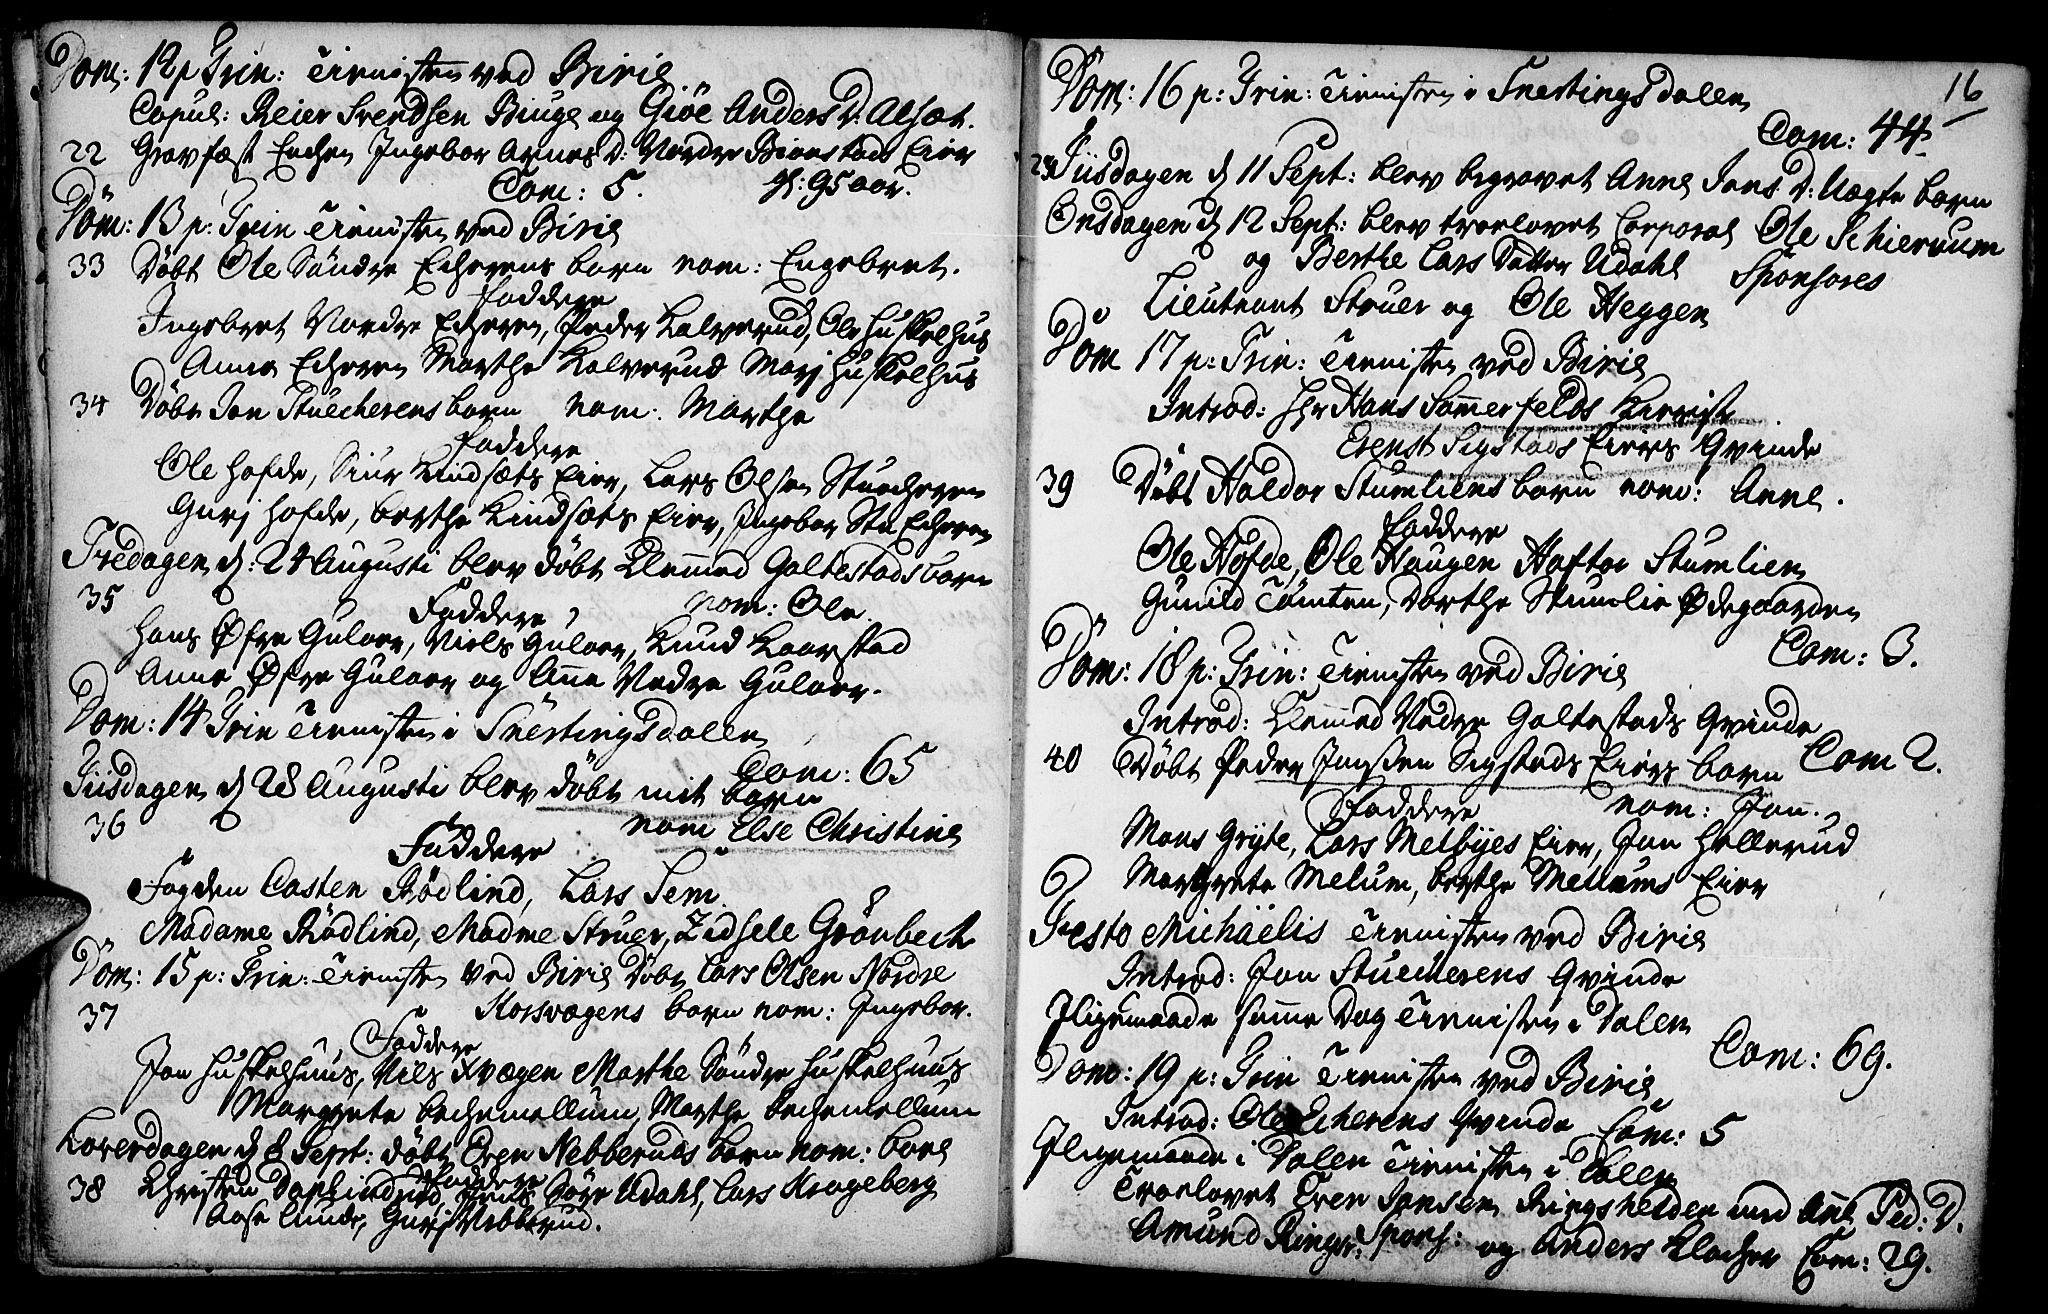 SAH, Biri prestekontor, Parish register (official) no. 1, 1730-1754, p. 16